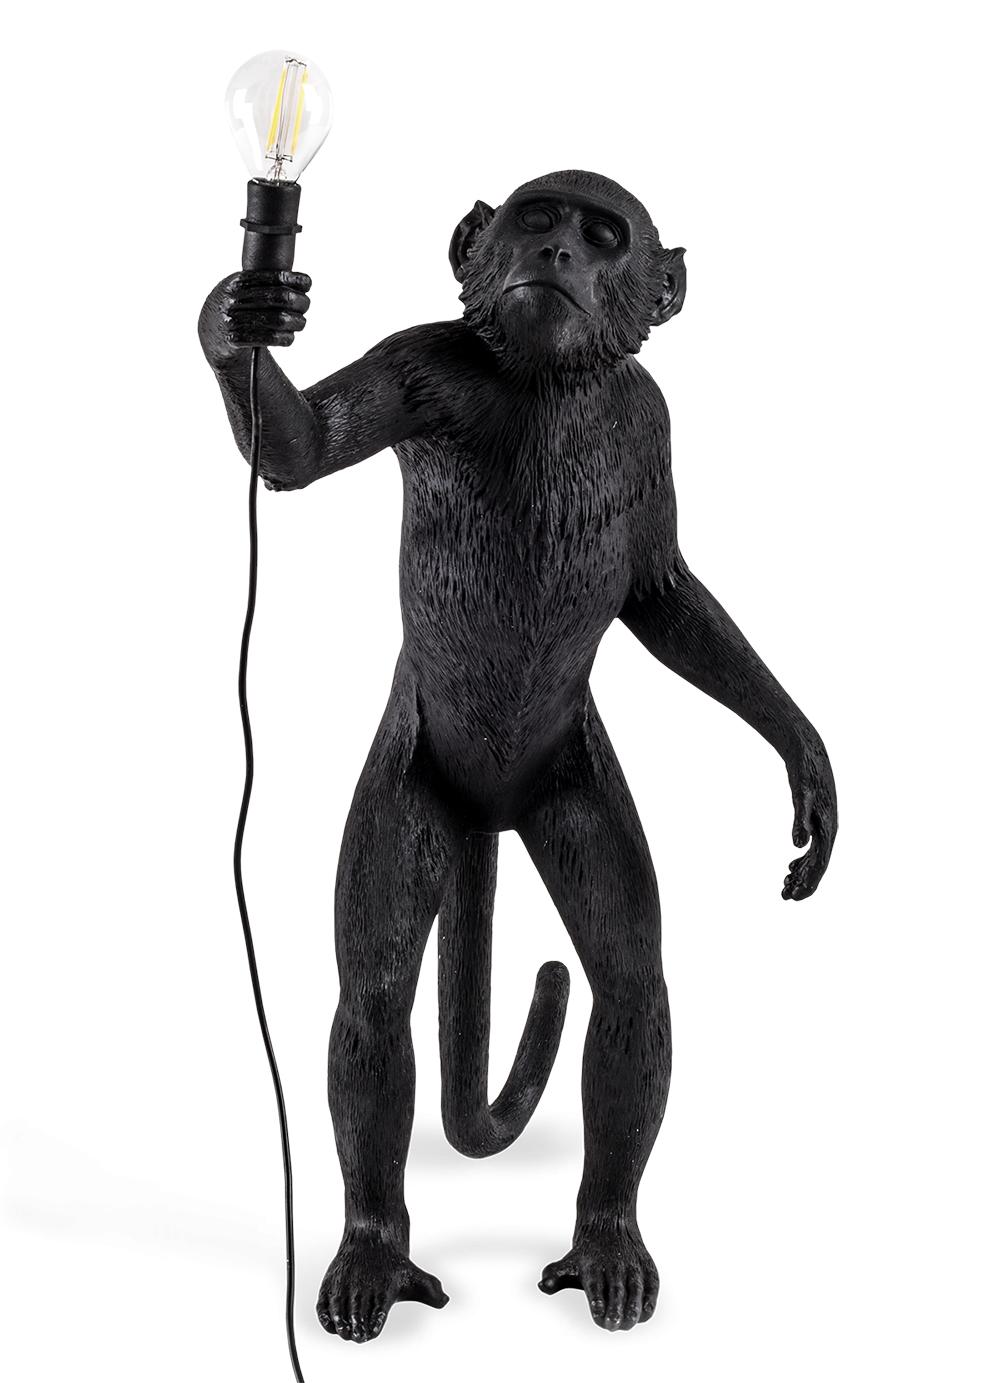 Seletti Outdoor Monkey Lamp, Standing